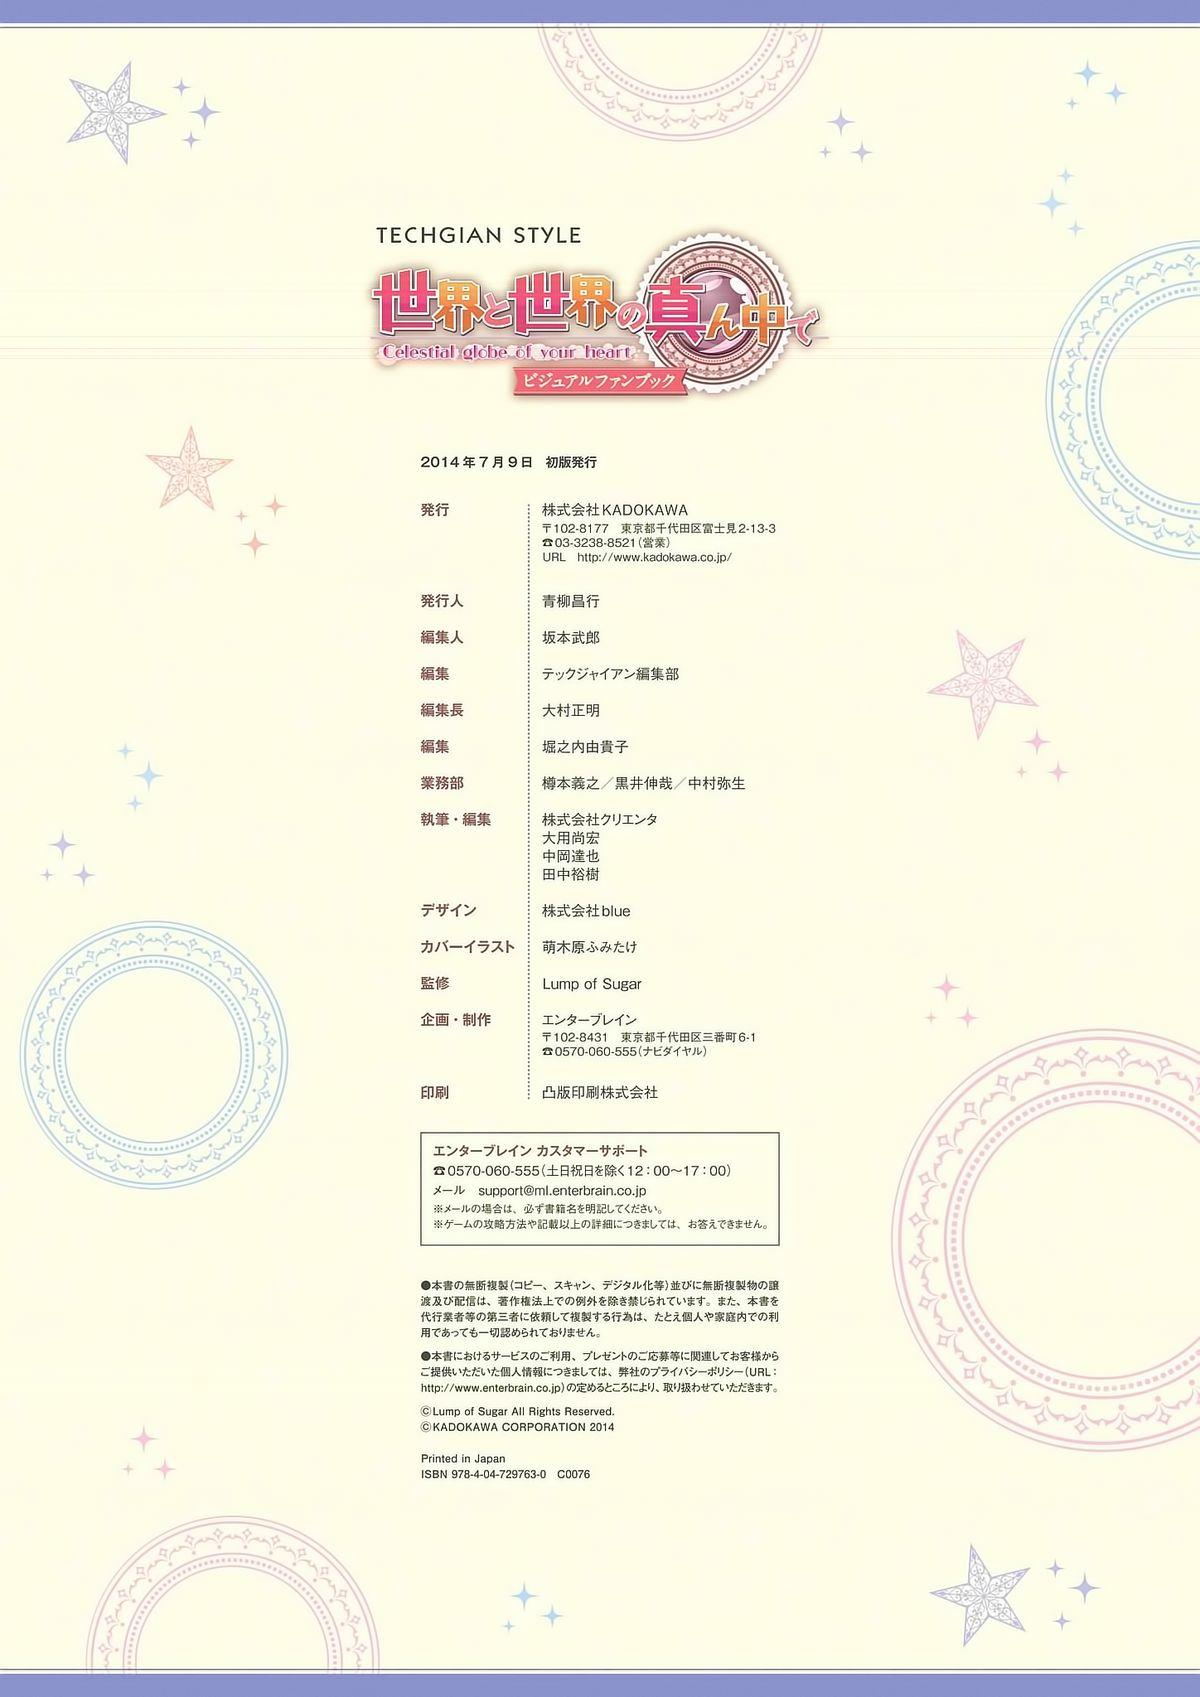 Sekai to Sekai no Mannaka de Visual Fanbook 125